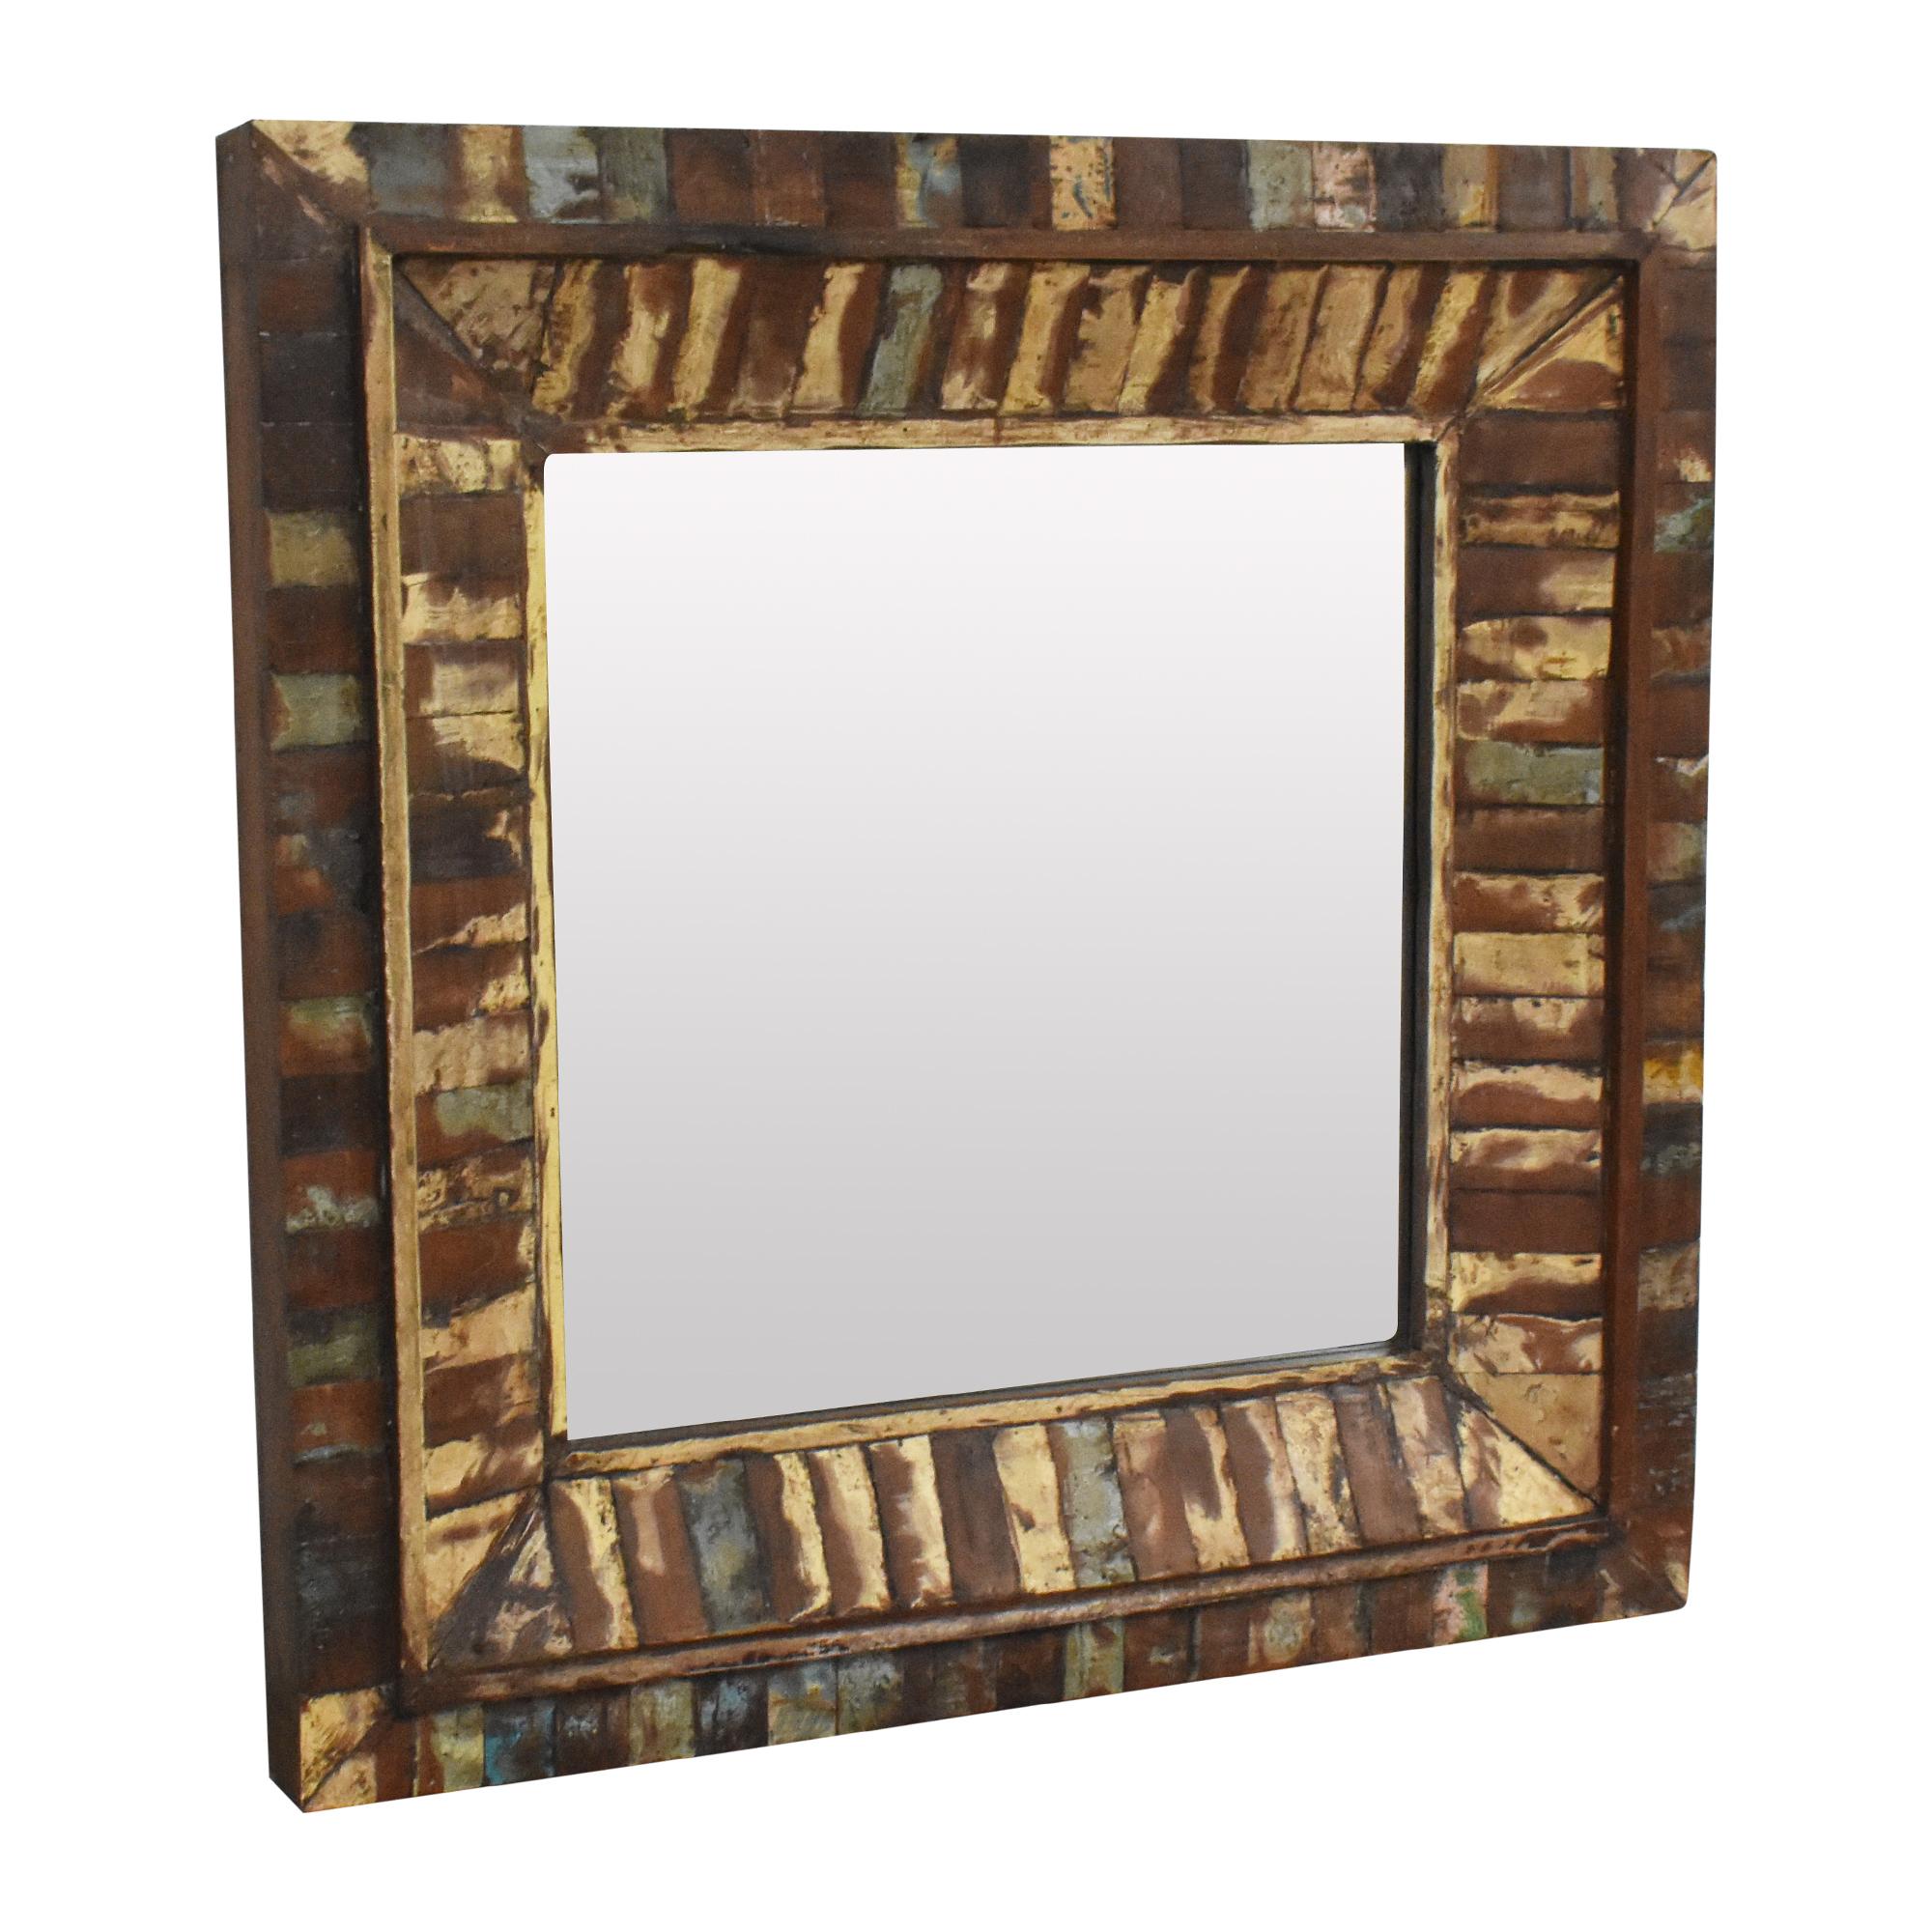 buy Rustic Framed Wall Mirror  Decor